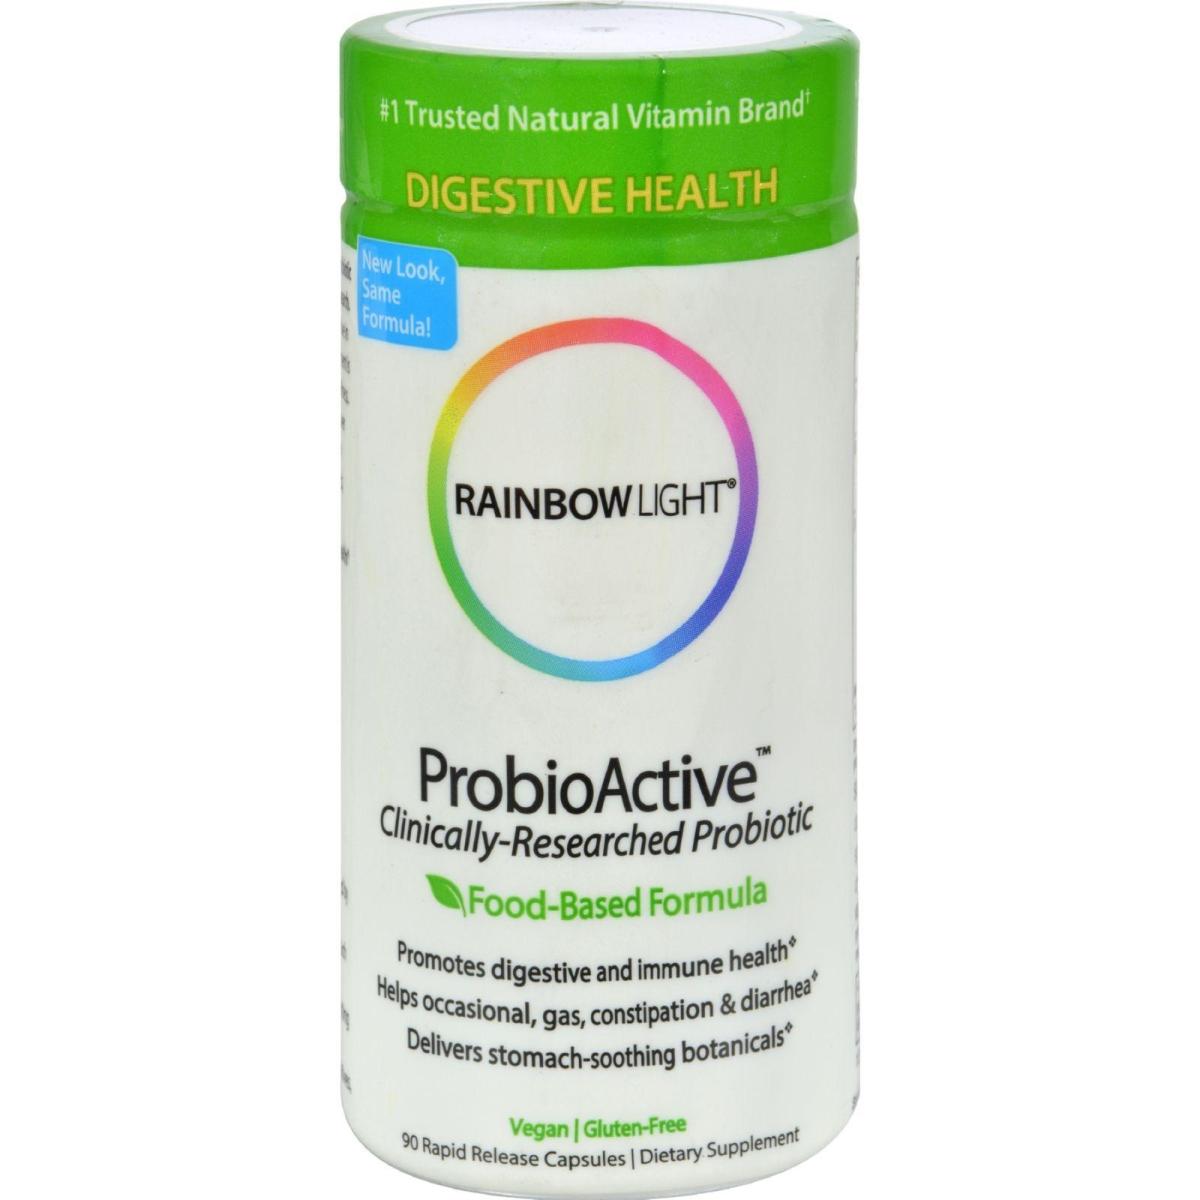 Rainbow Light HG0392928 Probioactive 1b 90 Vegetarian Capsules